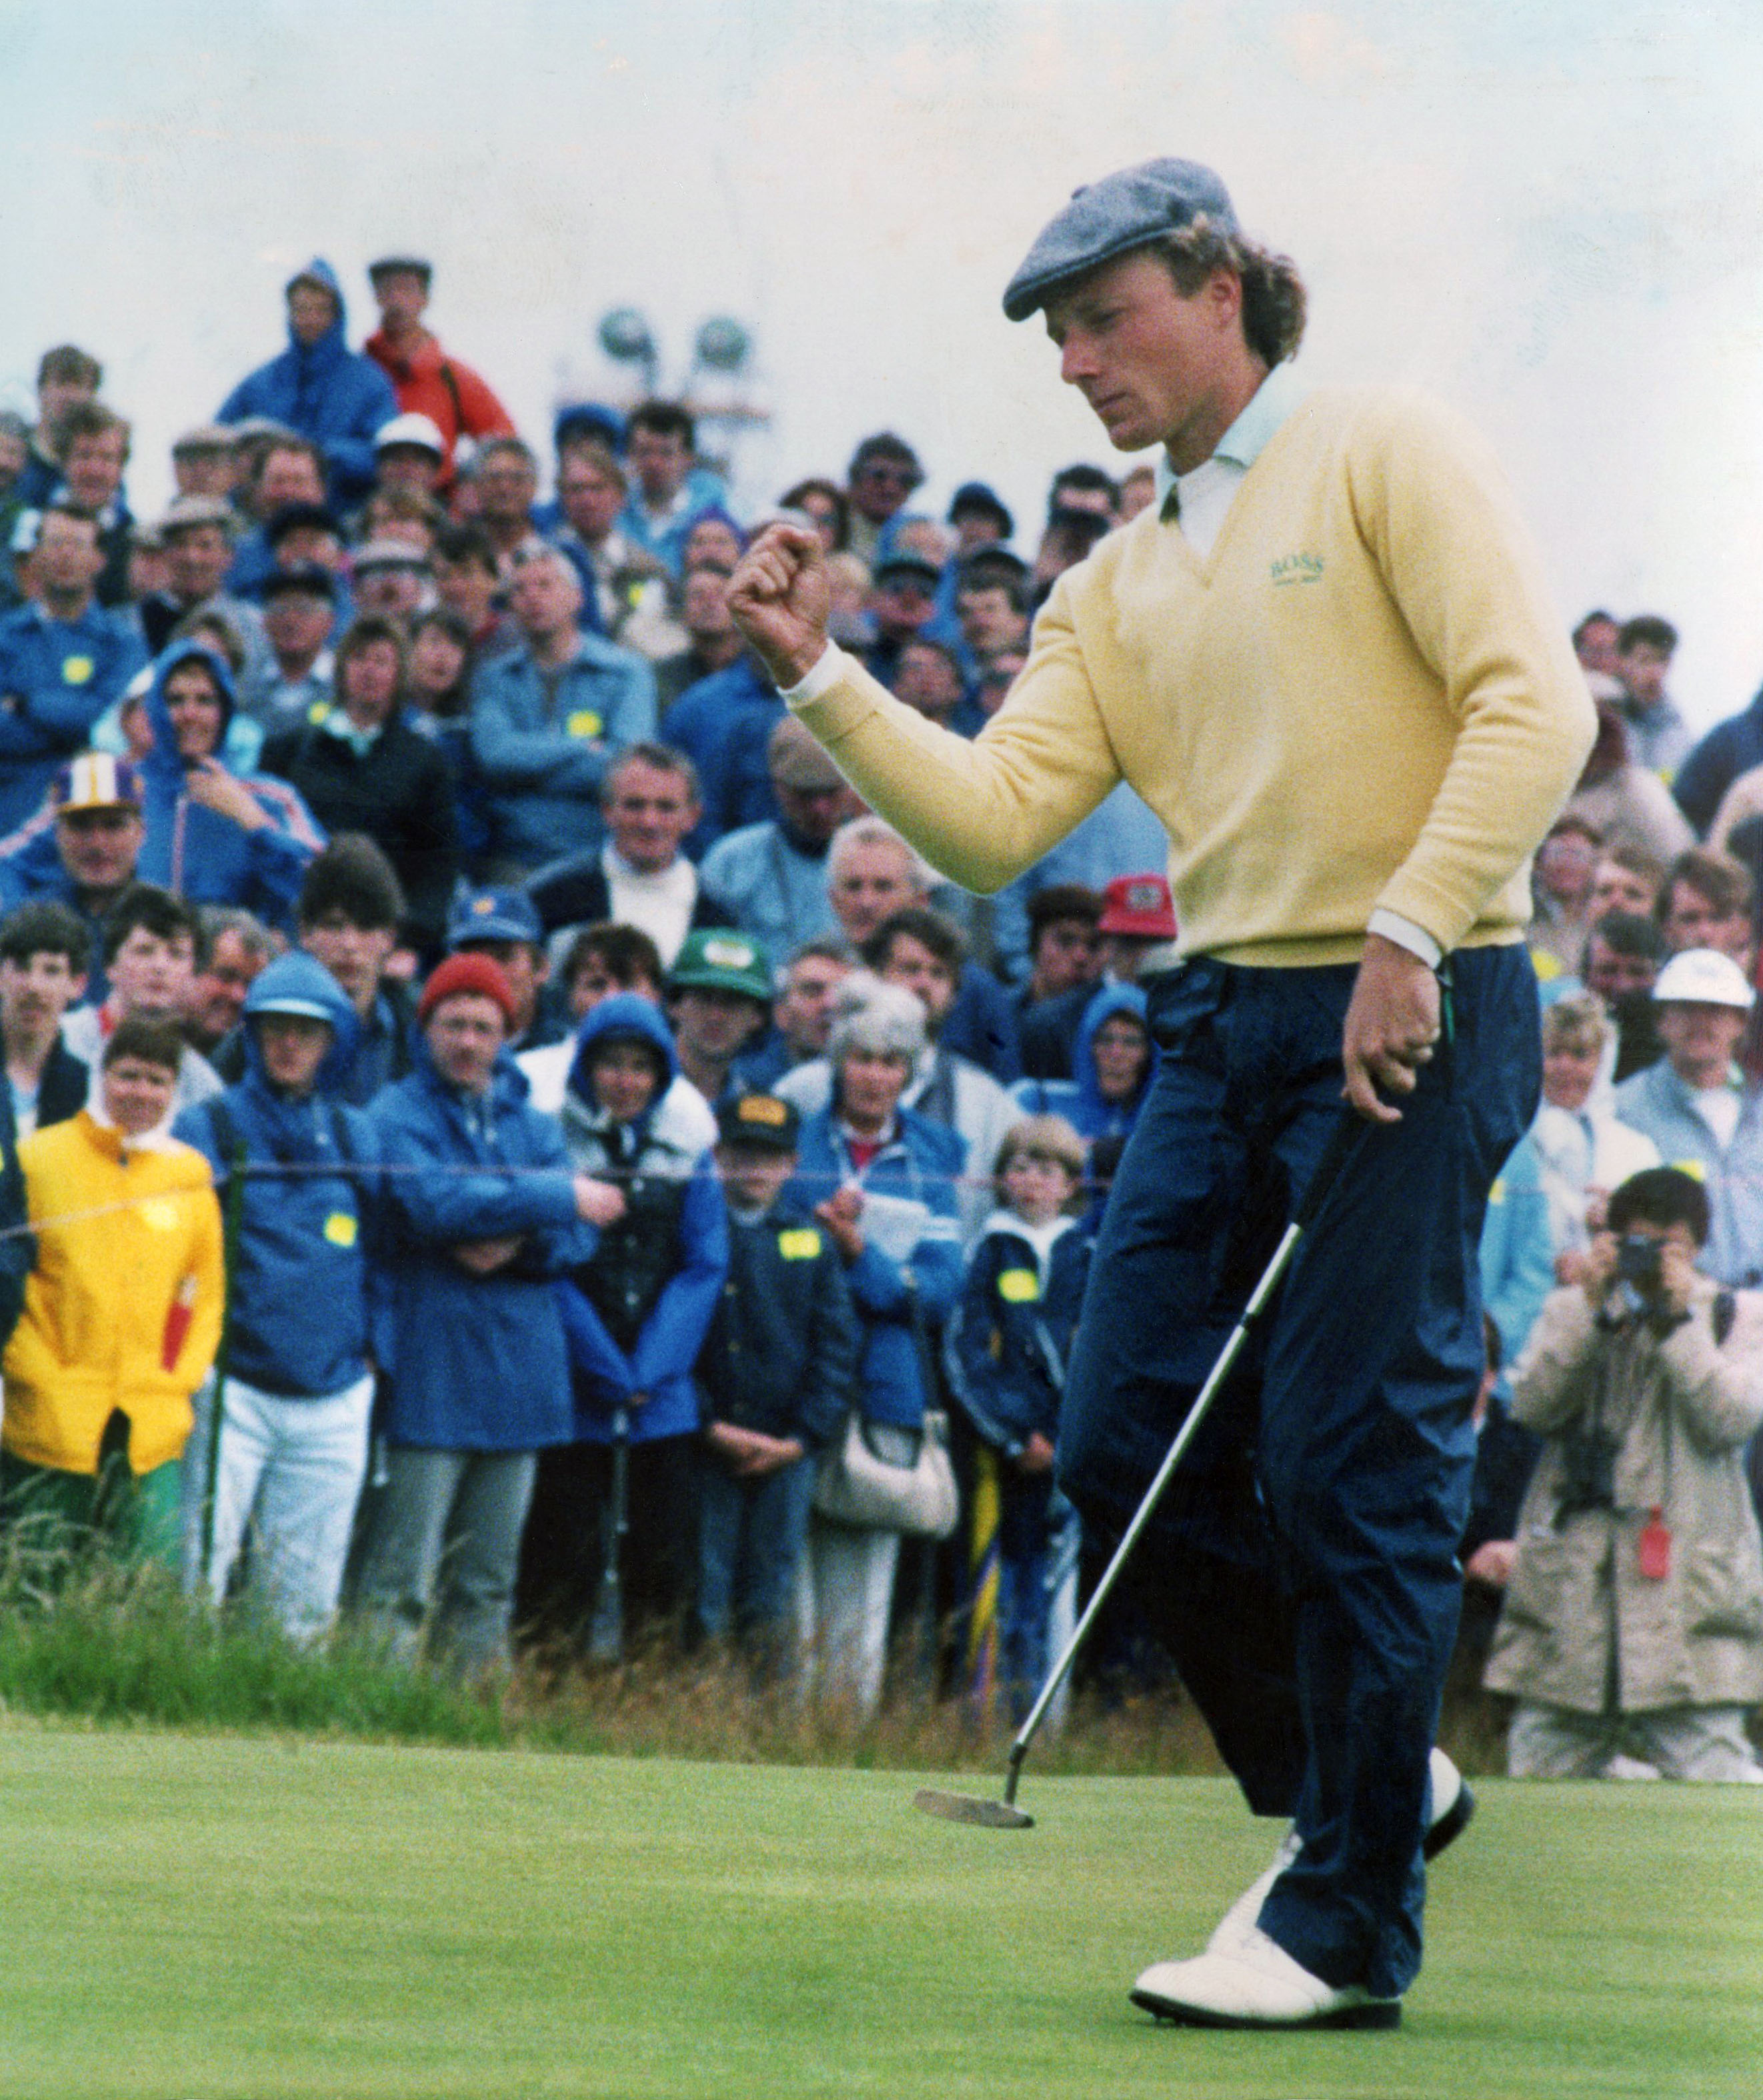 1. 1985: Langer's jacket double